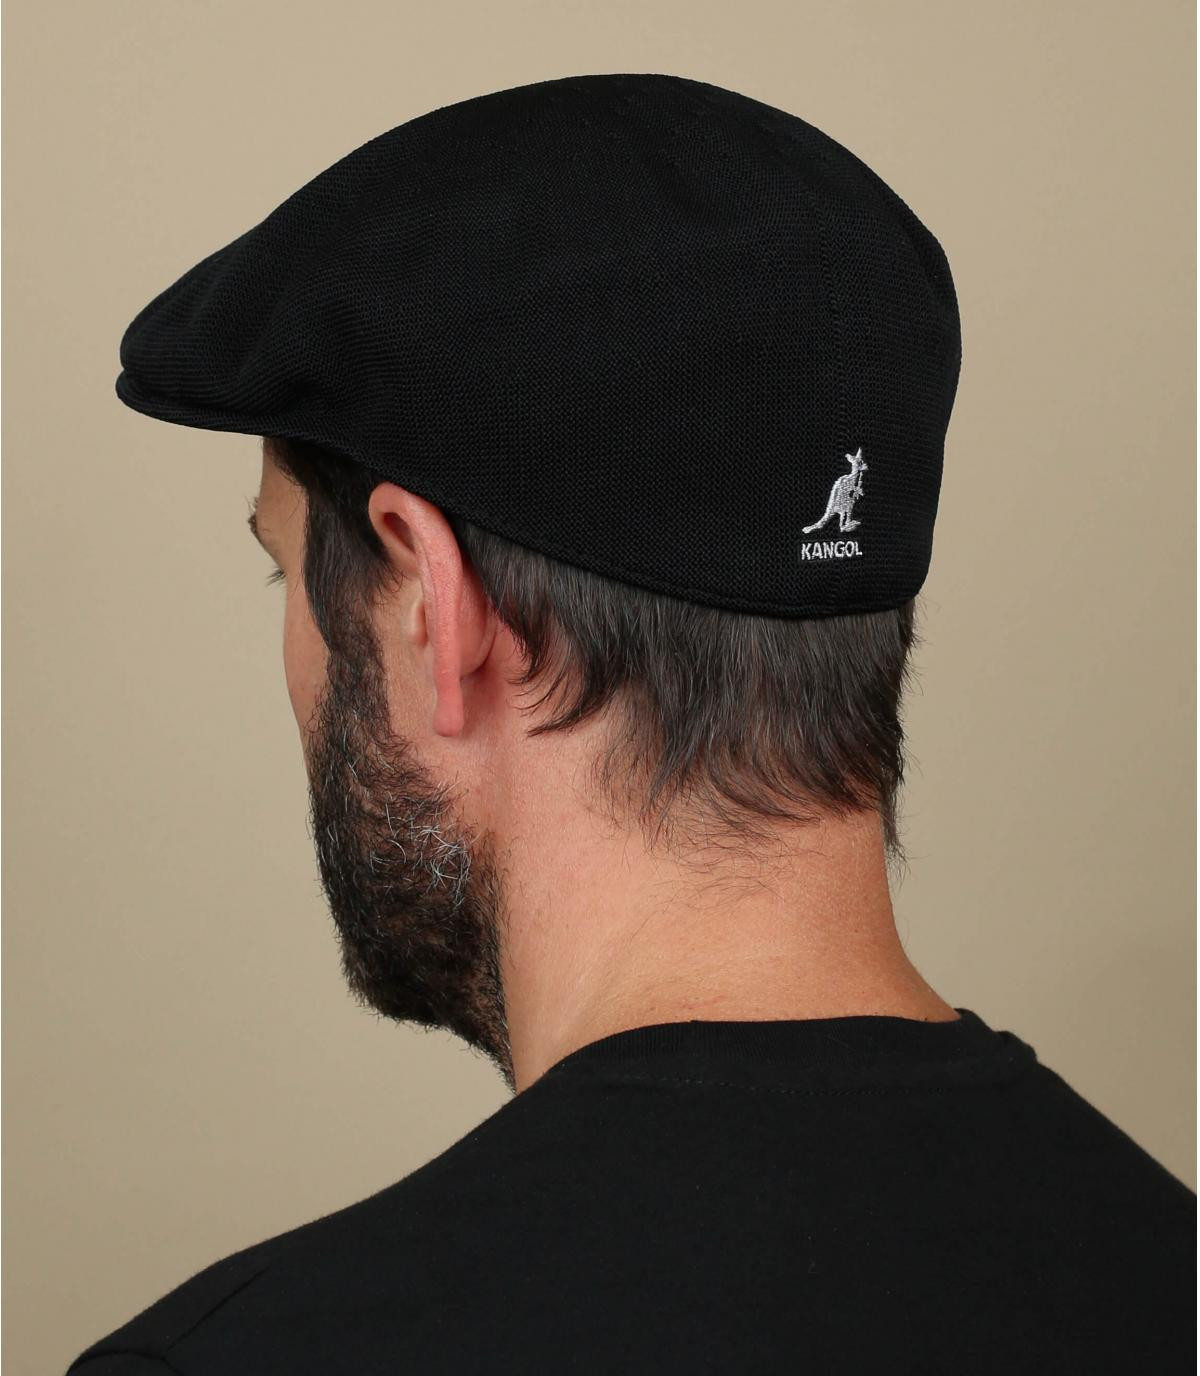 Kangol 504 tropic black